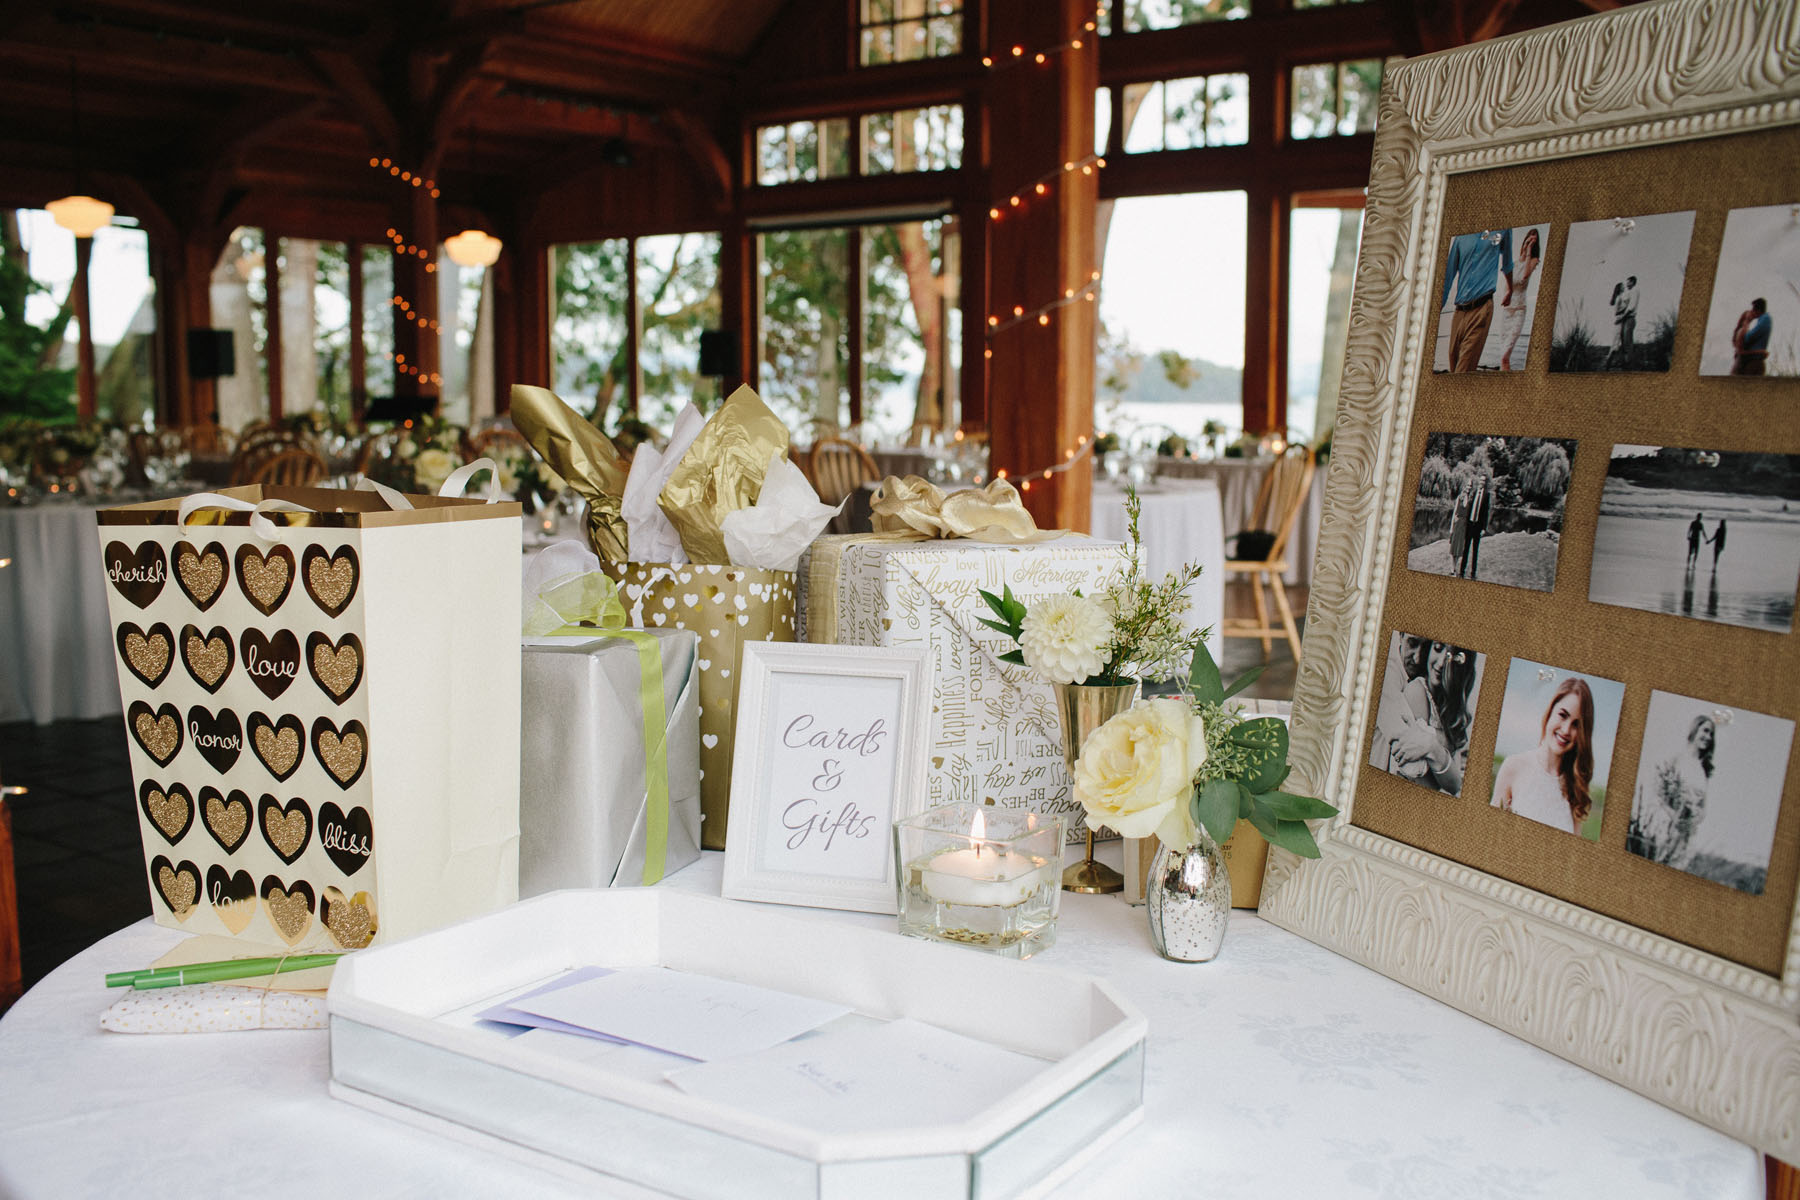 thetis-island-wedding-photographer-rp-rn-150.jpg